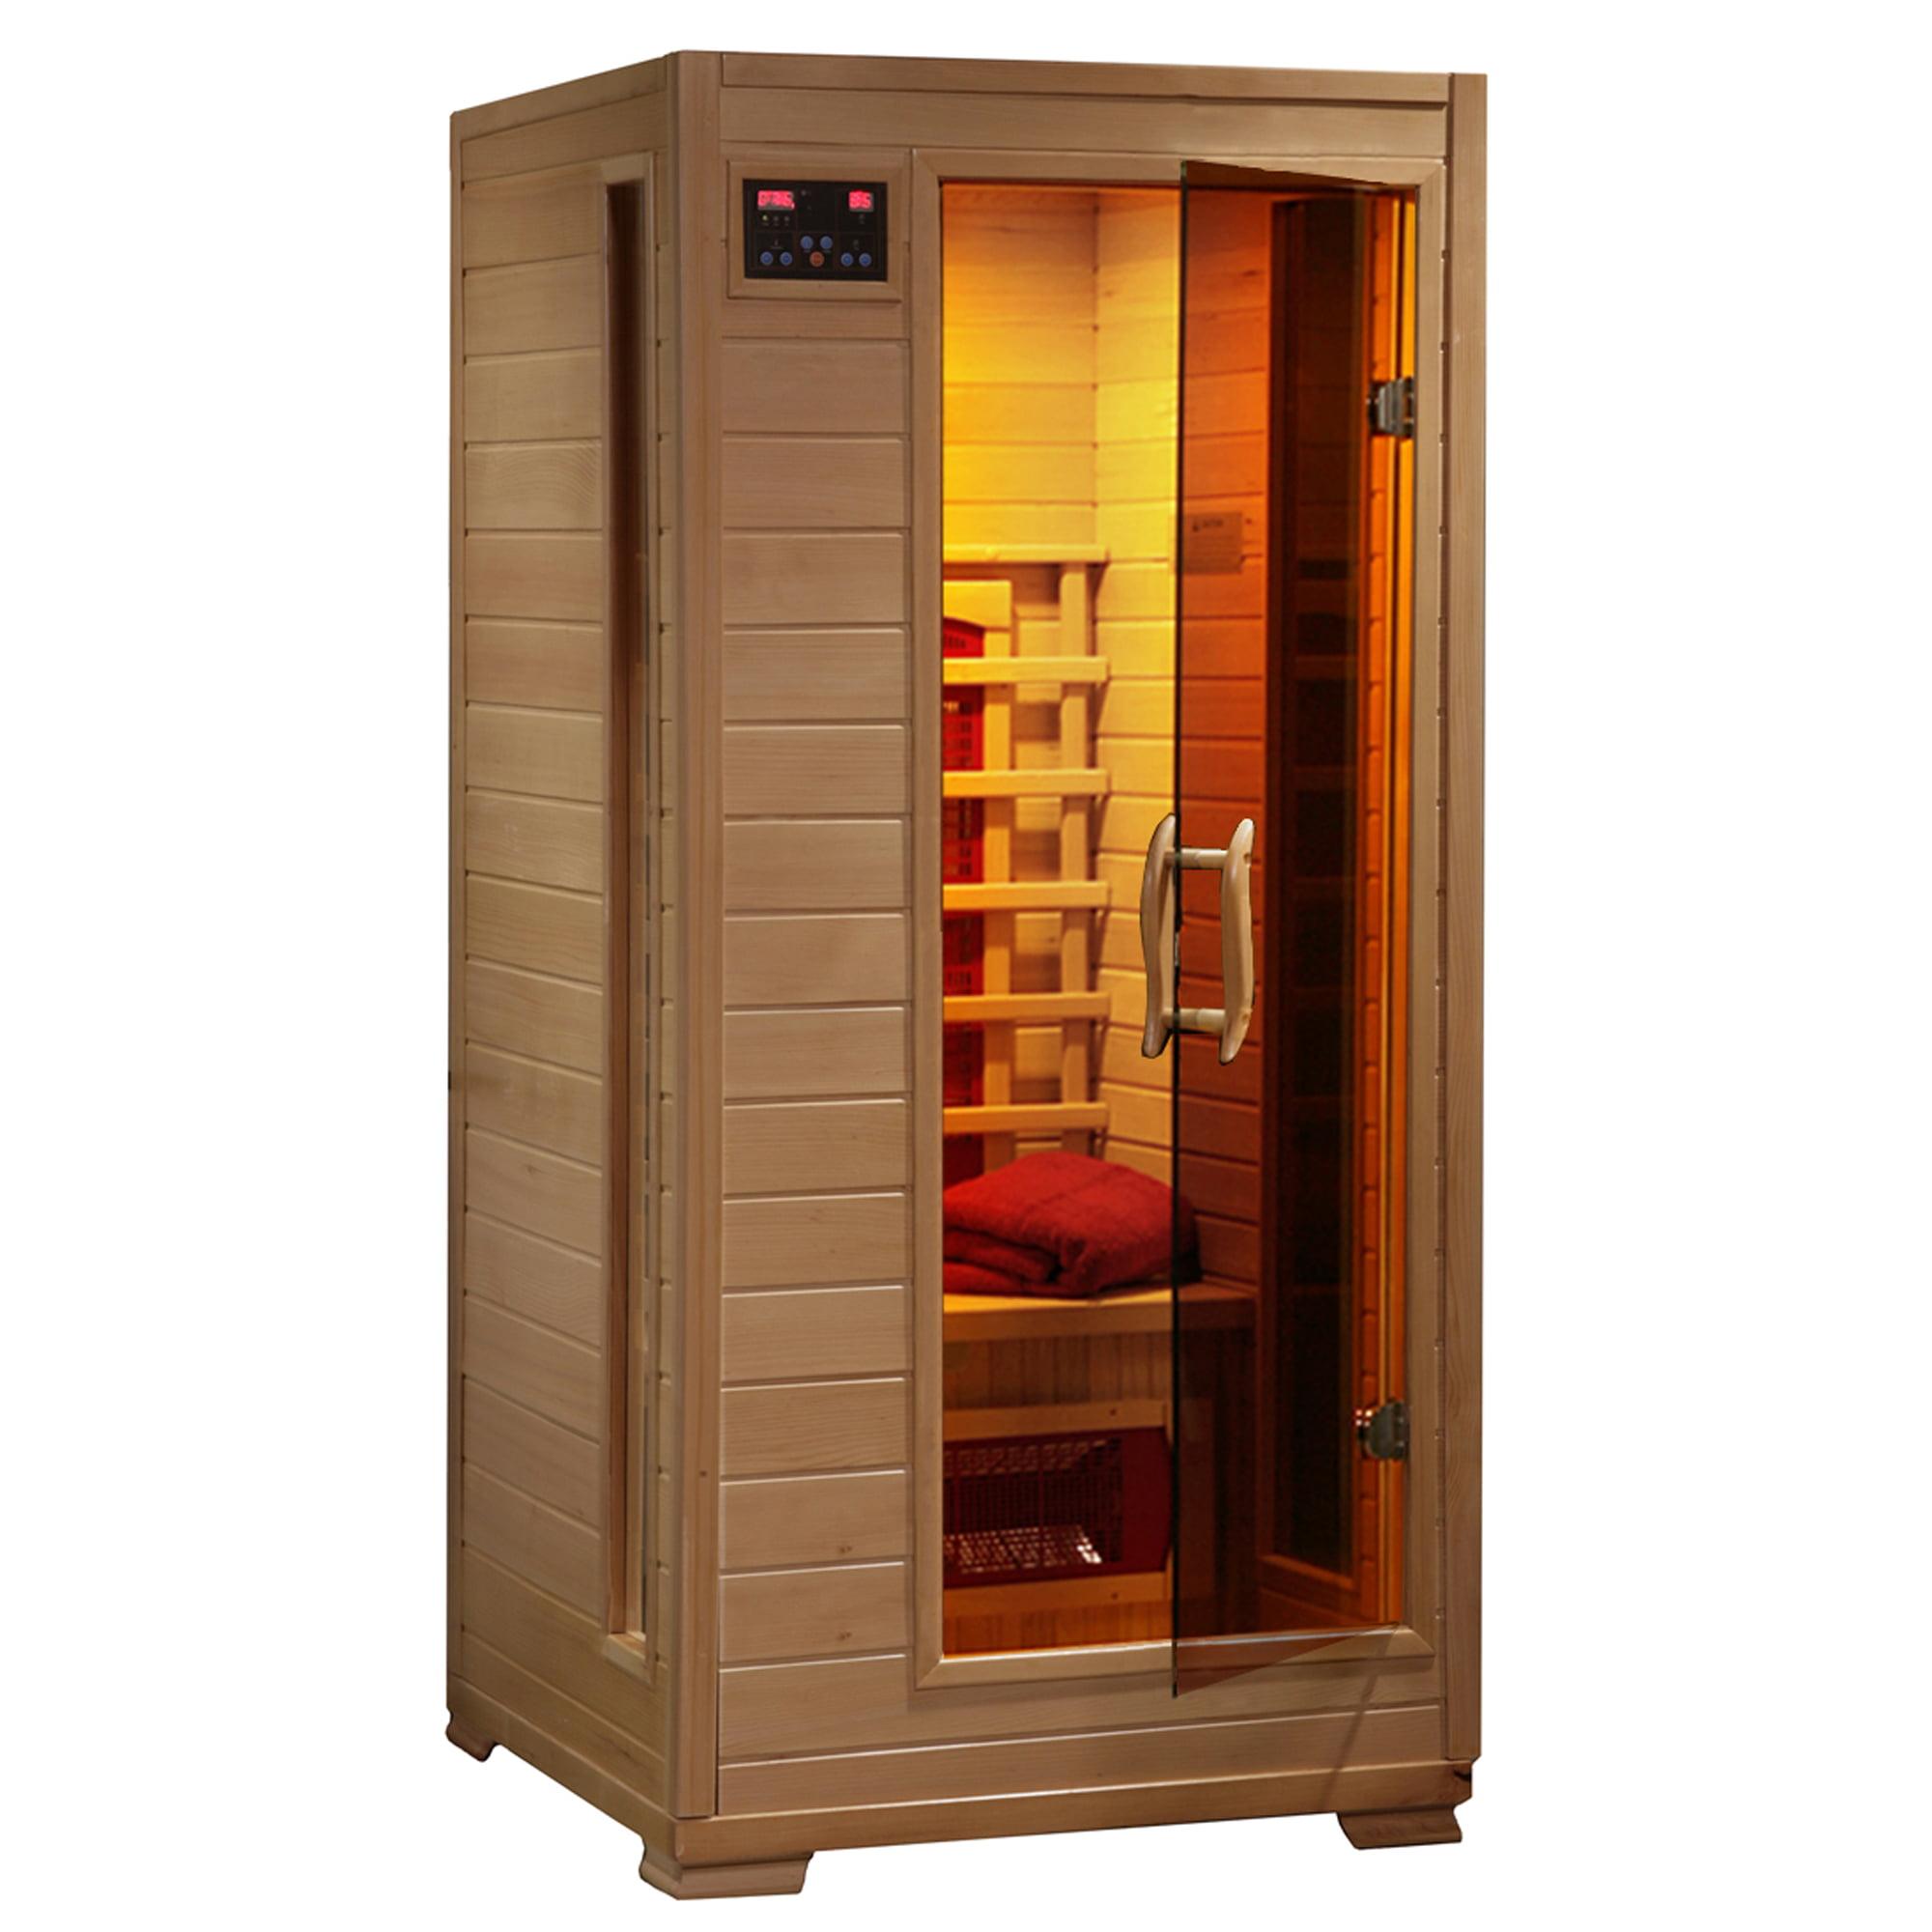 Radiant Saunas 1-2 Person Hemlock Infrared Sauna w/ 3 Ceramic Heaters